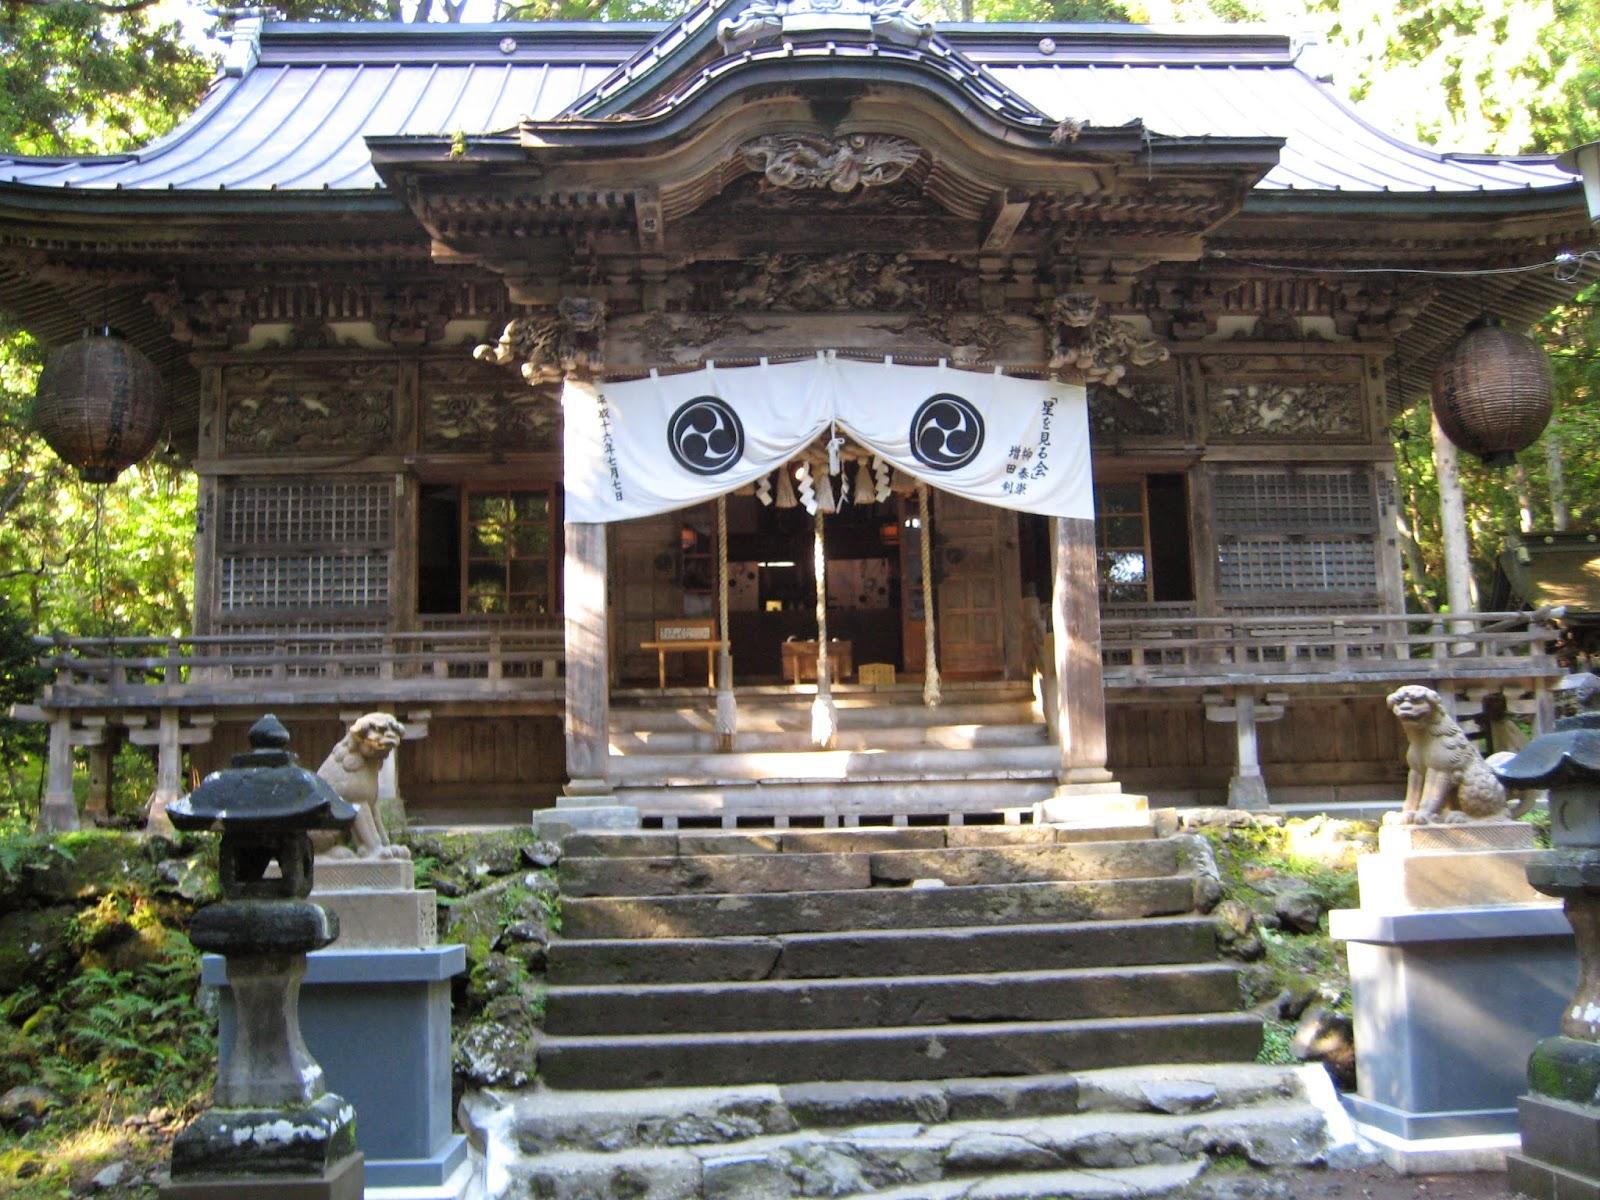 Towada Jinja (Shrine) Lake Towada Towadako 十和田湖 十和田神社